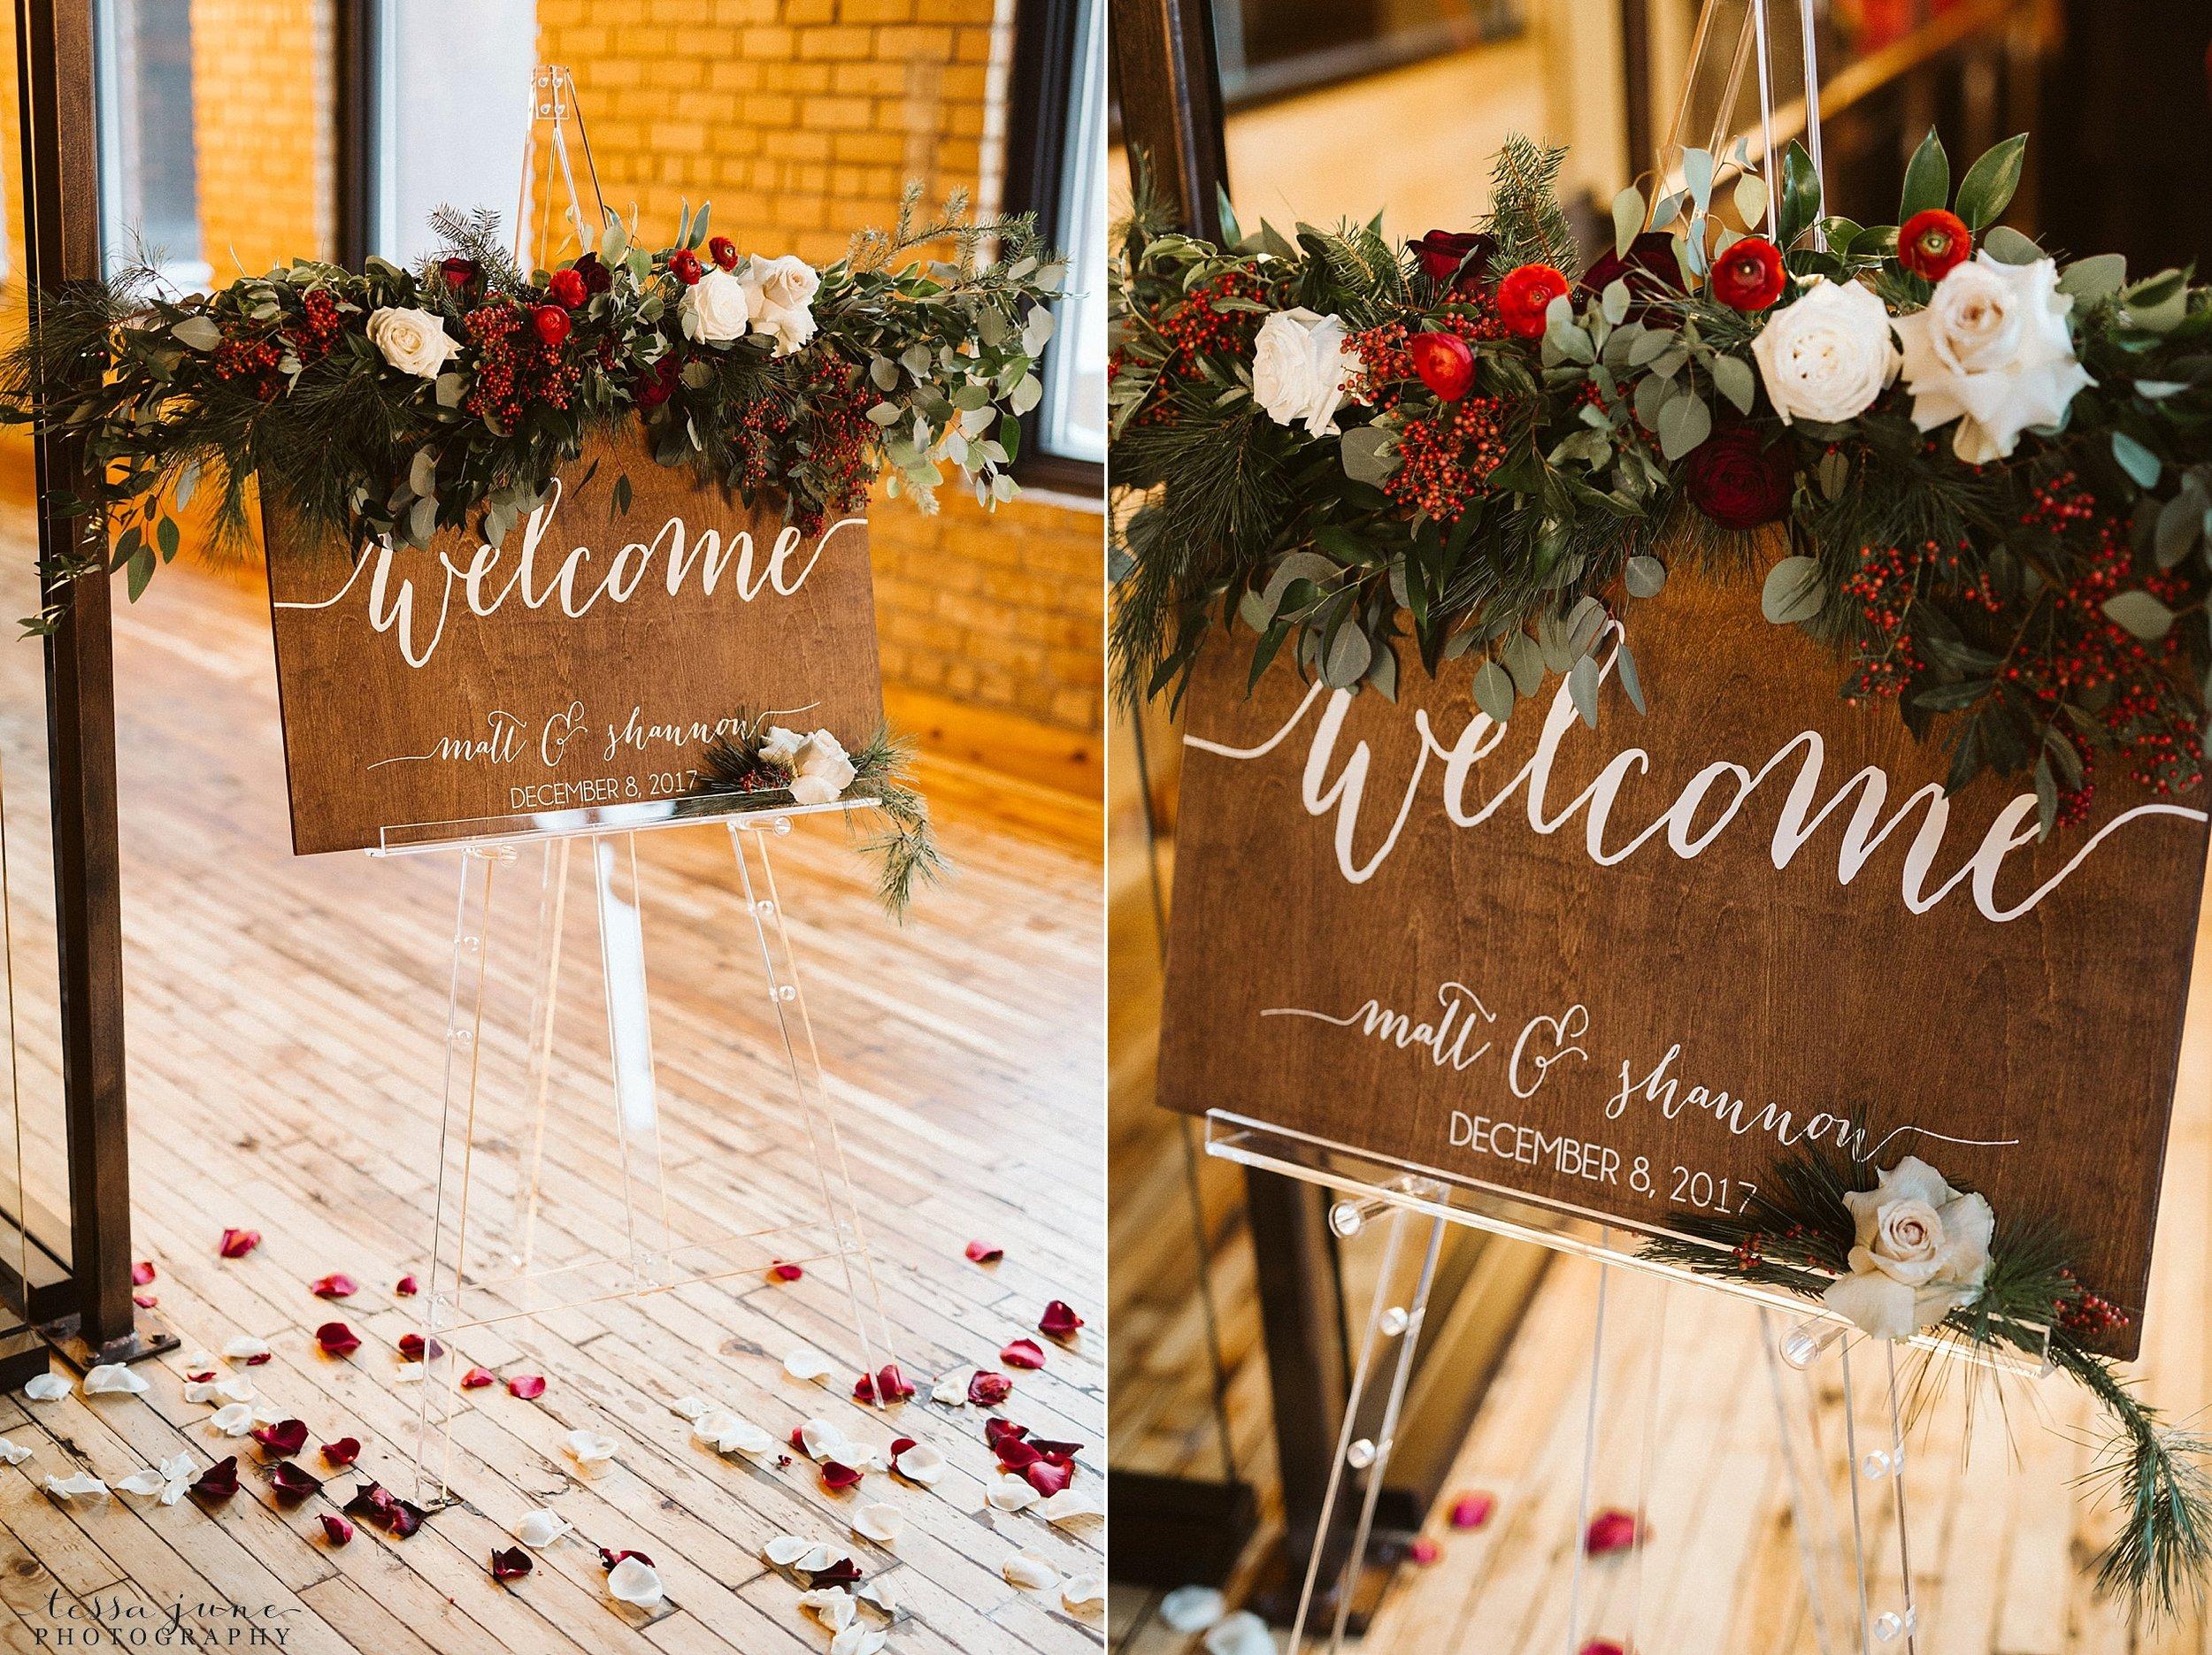 minneapolis-event-center-winter-romantic-snow-wedding-december-135.jpg